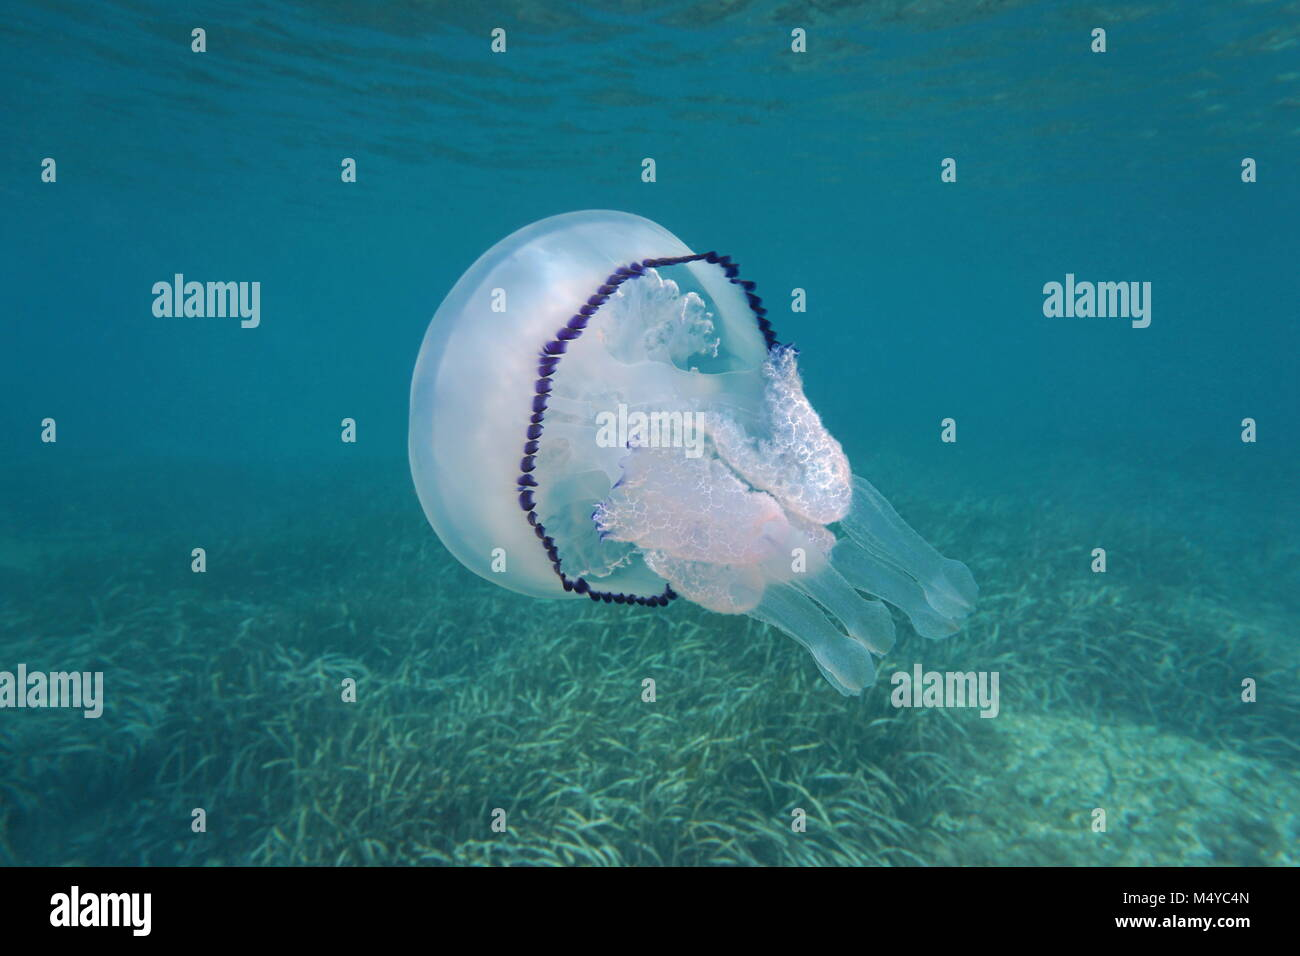 A barrel jellyfish Rhizostoma pulmo underwater in the Mediterranean sea, Cote d'Azur, France - Stock Image